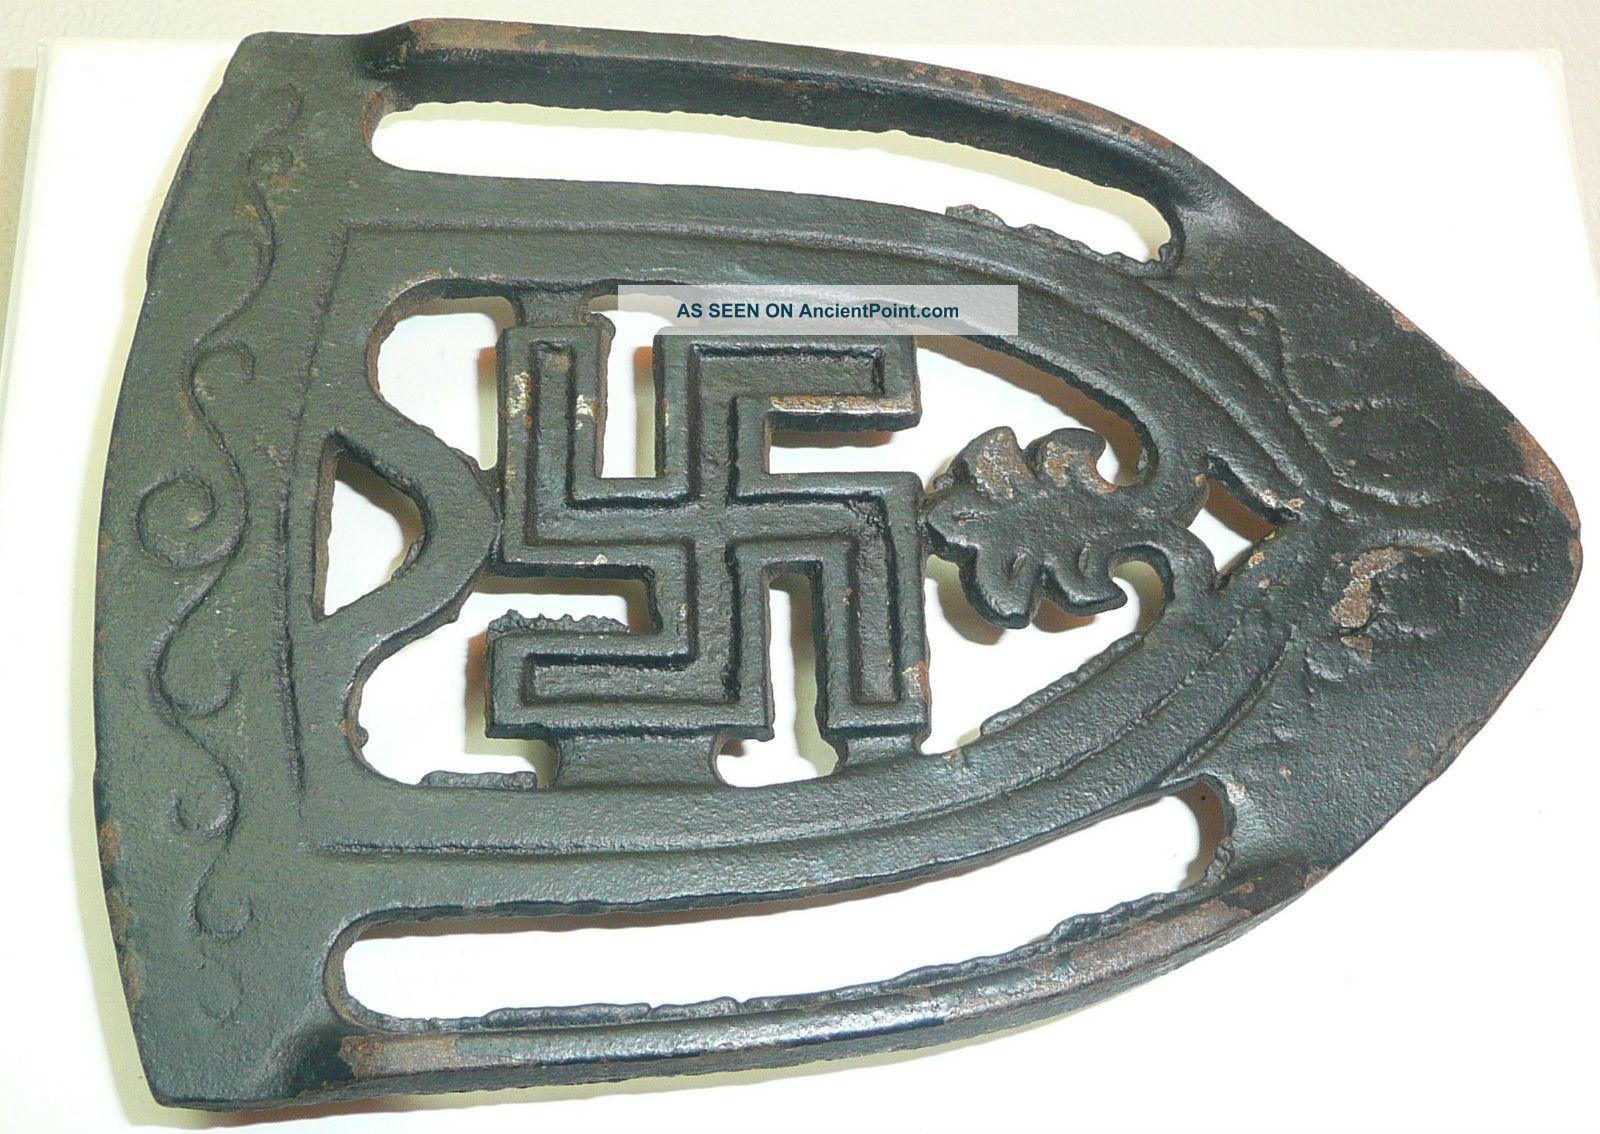 Antique Cast Iron Swastika Good Luck Trivet Early 1900s Era Pre - Ww2 Scroll Rare Trivets photo